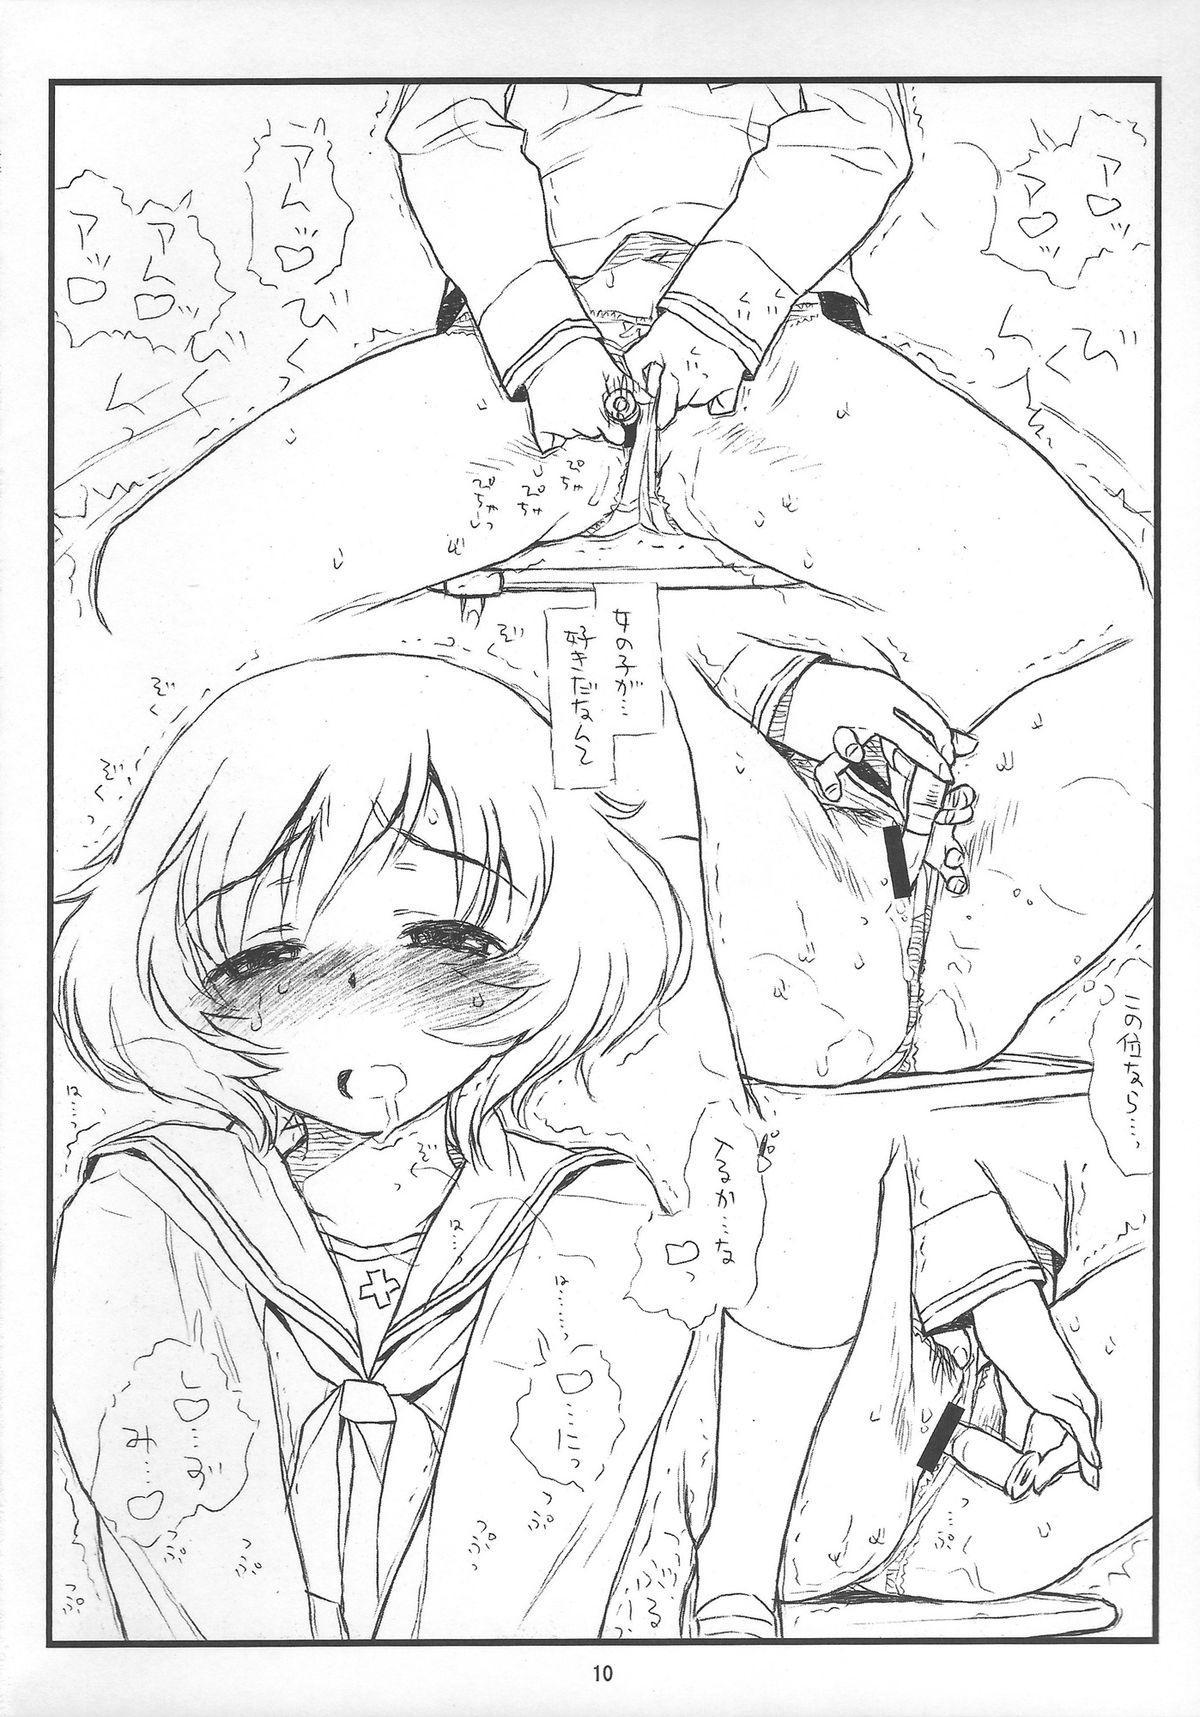 (C84) [bolze.] 「Honanie + Akiyama-dono Sennyudaisakusen (Sippai)」 (Girls und Panzer) 9